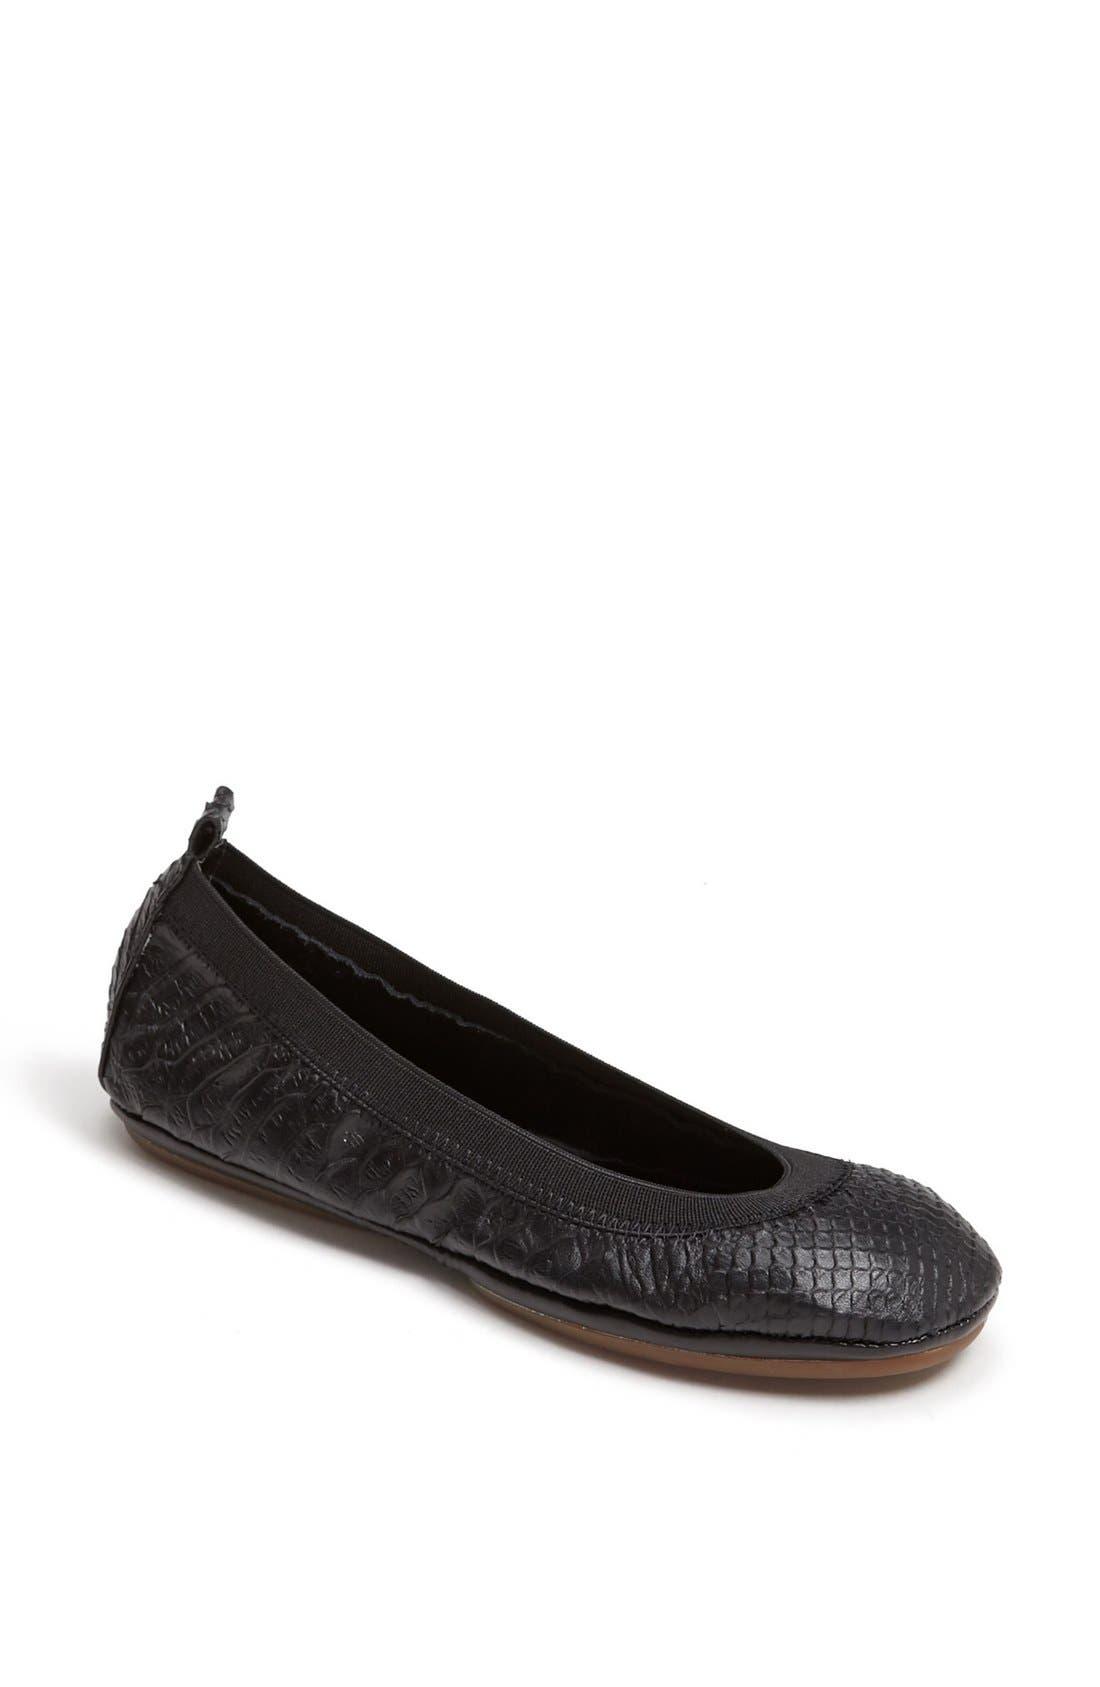 Main Image - Yosi Samra Croc Embossed Foldable Ballet Flat